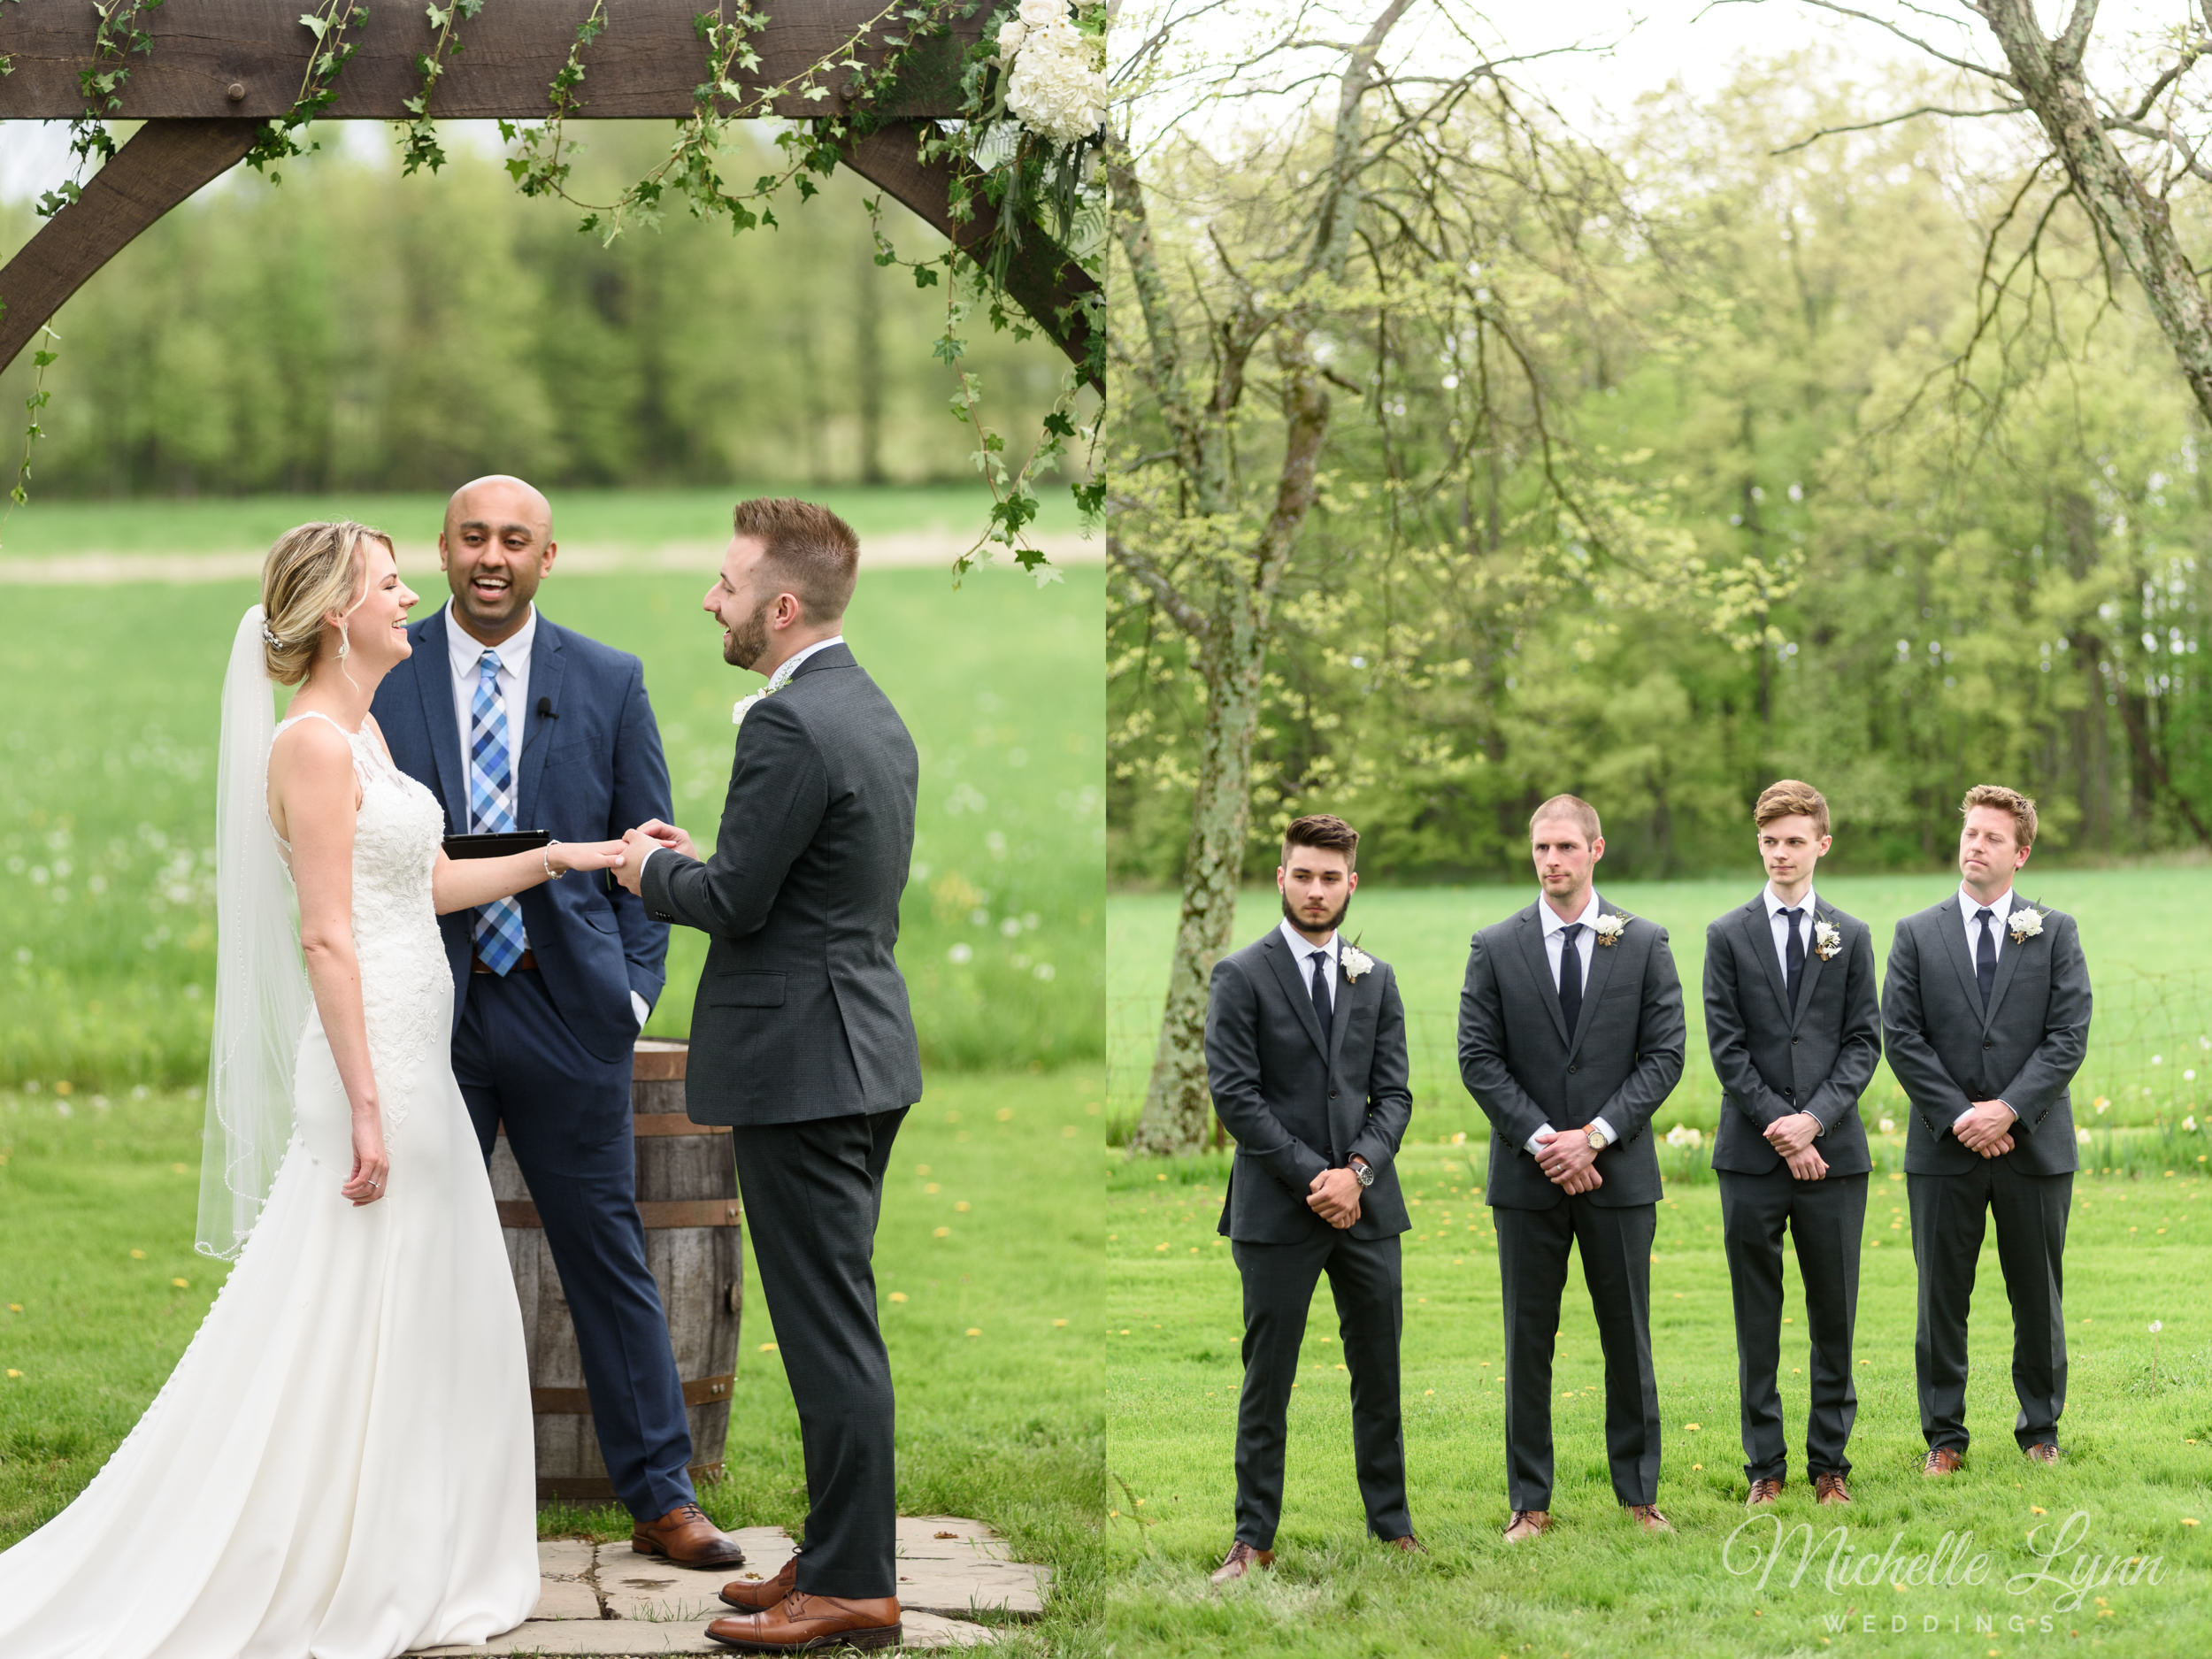 mlw-the-farm-bakery-and-events-wedding-photos-42.jpg